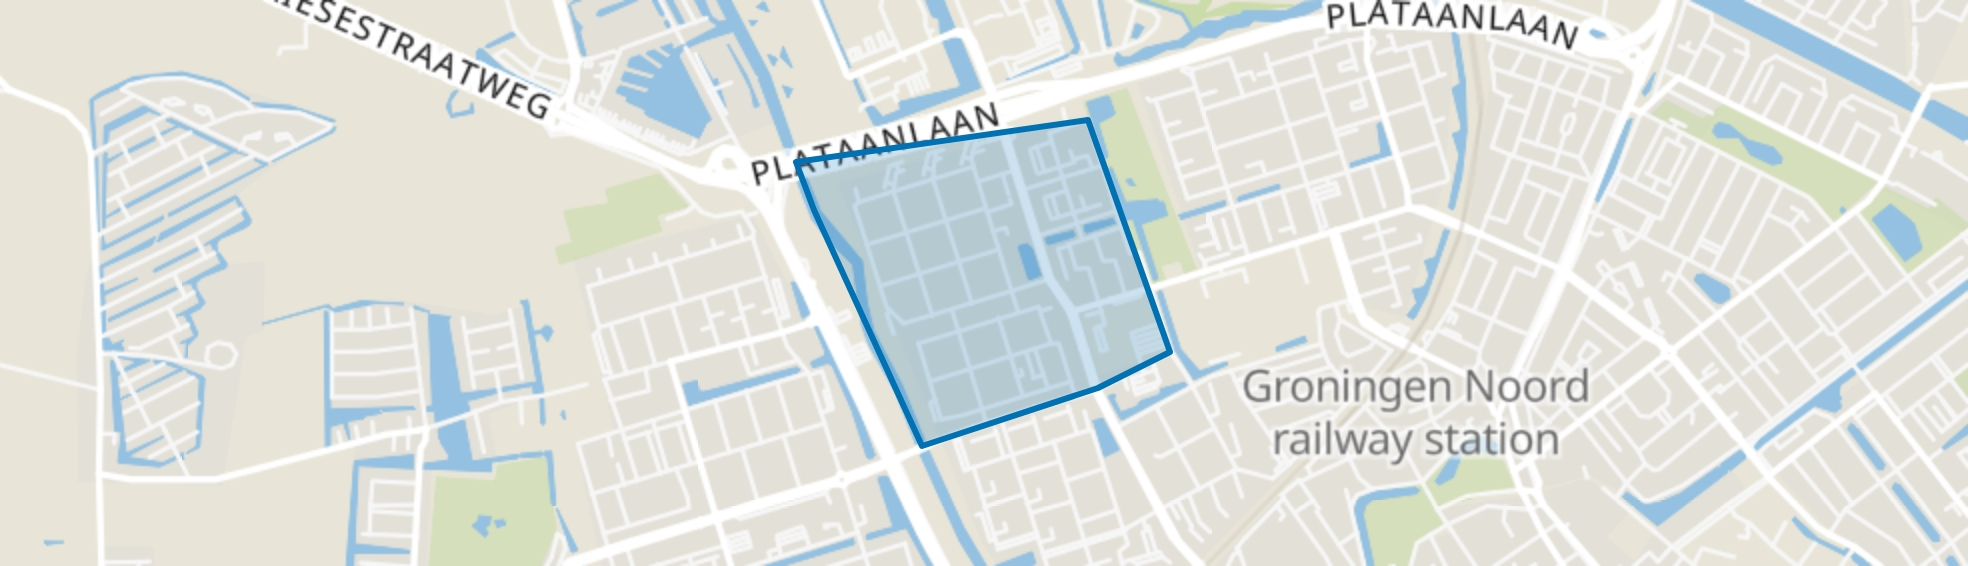 Paddepoel-Noord, Groningen map